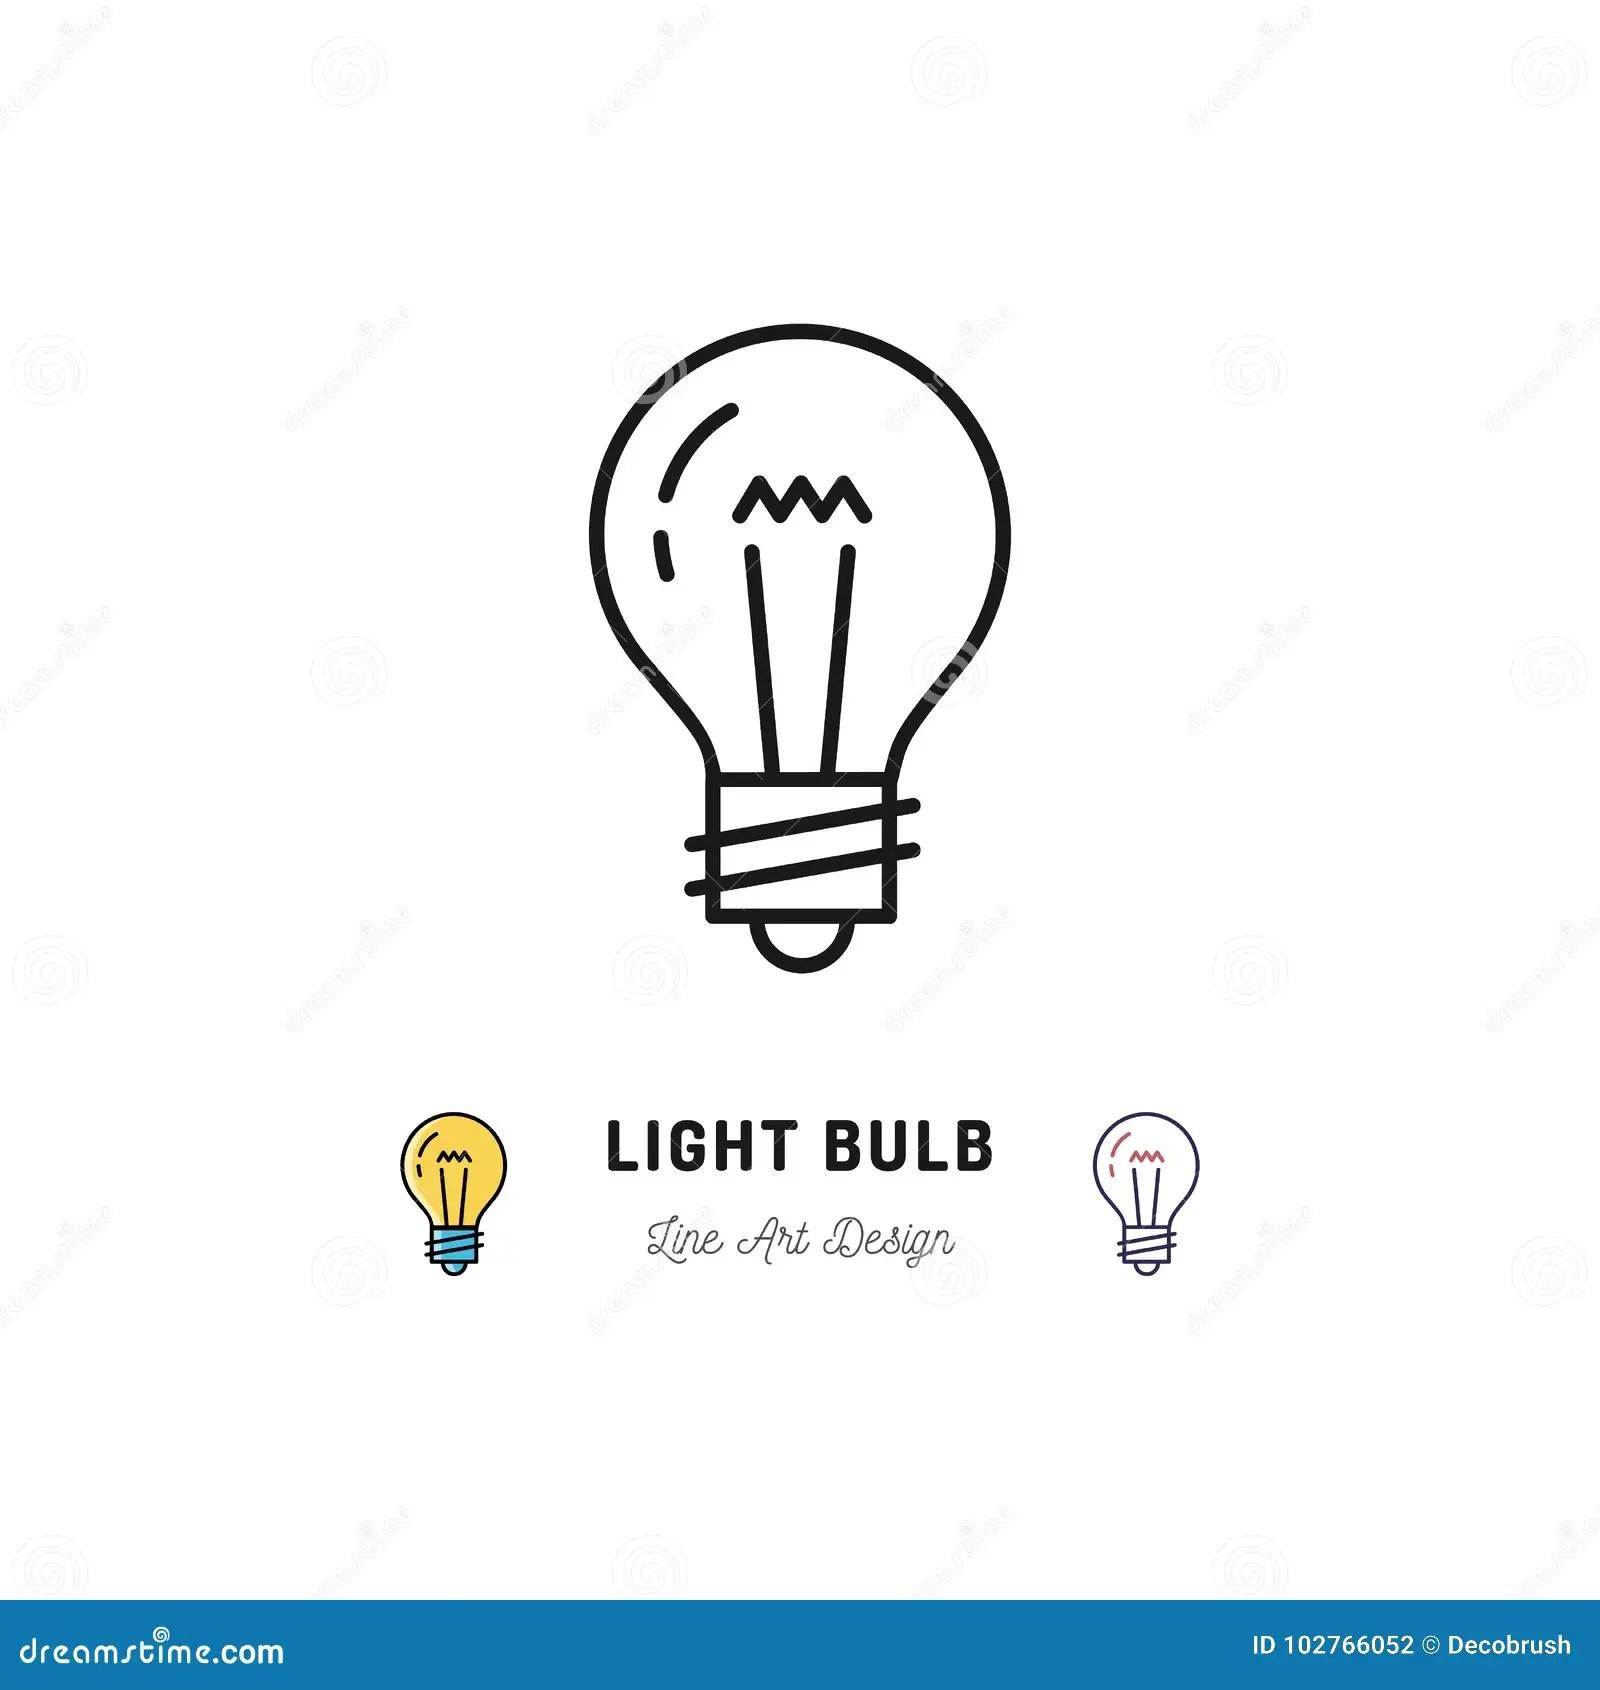 Light Bulb Icons Idea Icon Lightbulb Thin Line Art Icons